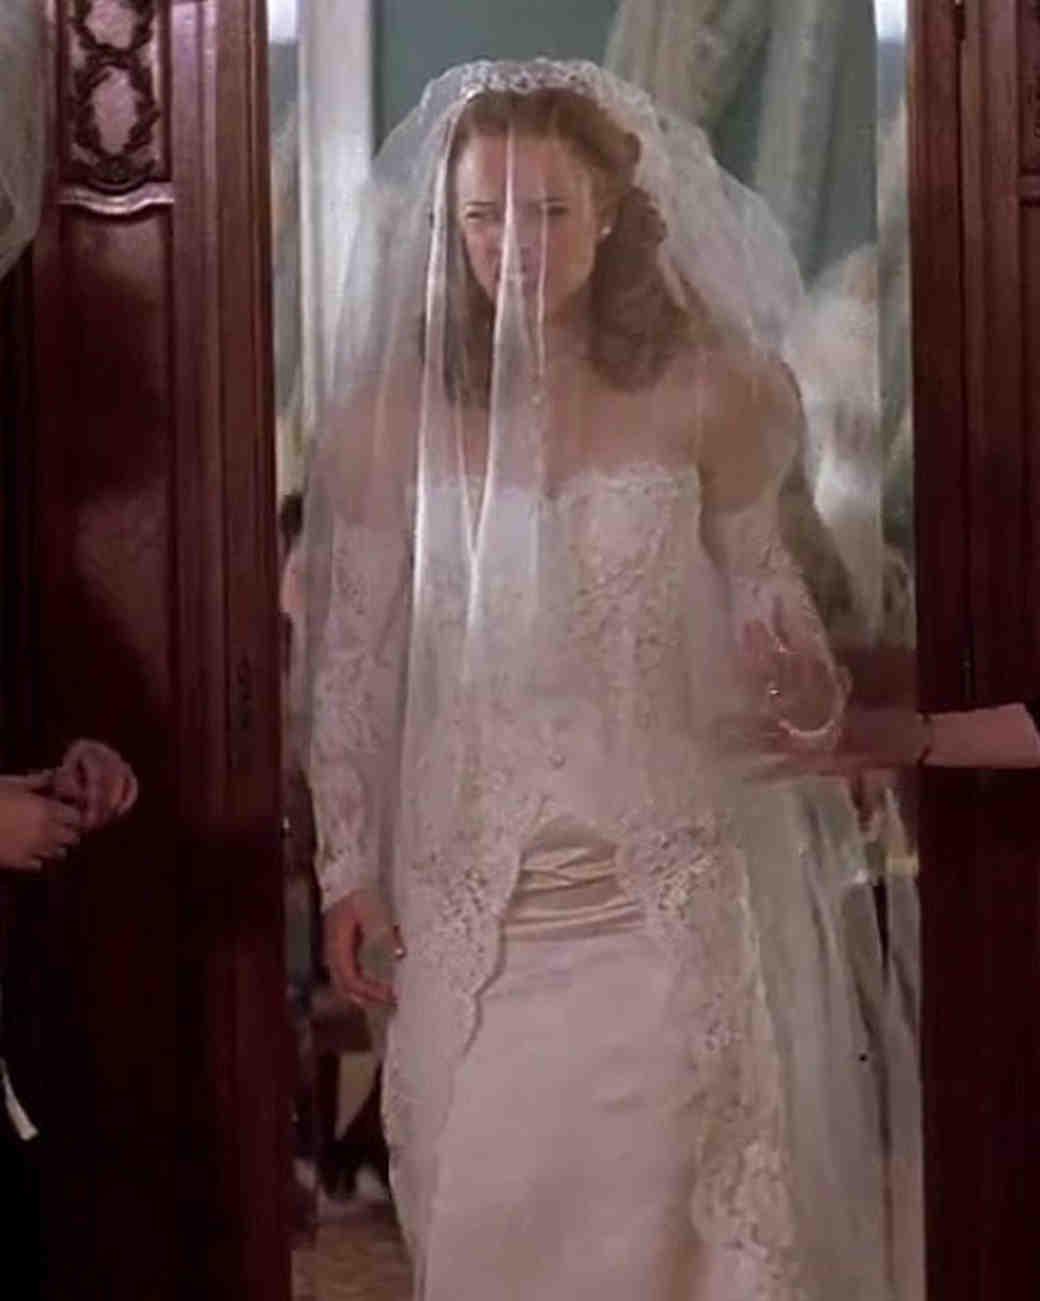 movie-wedding-dresses-the-notebook-rachel-mcadams-0316.jpg